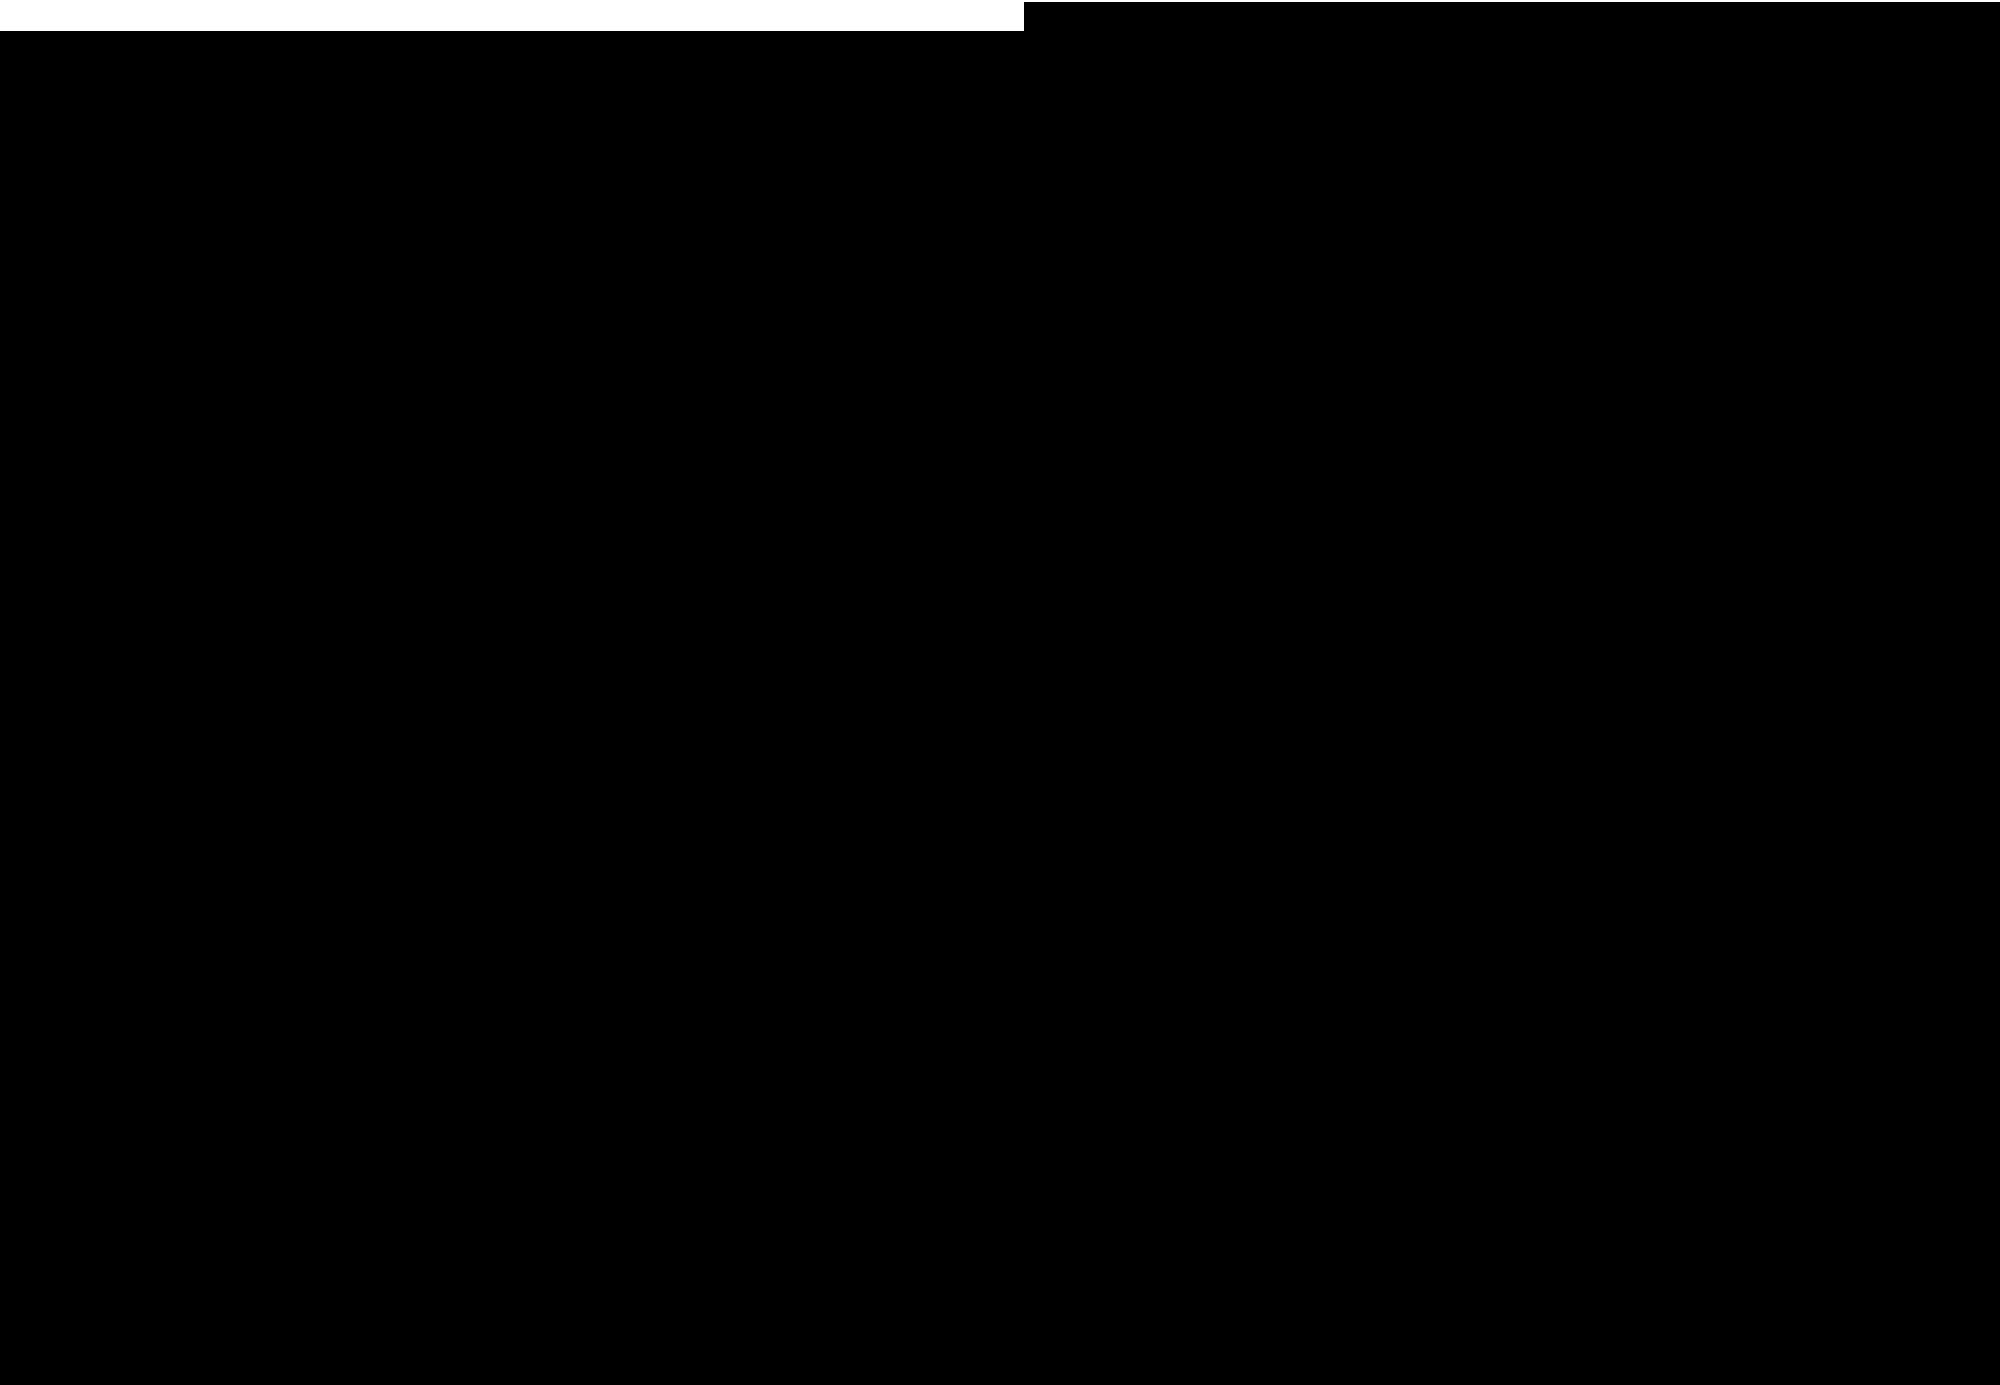 KRK-NIE-twin-01-schwarzplan